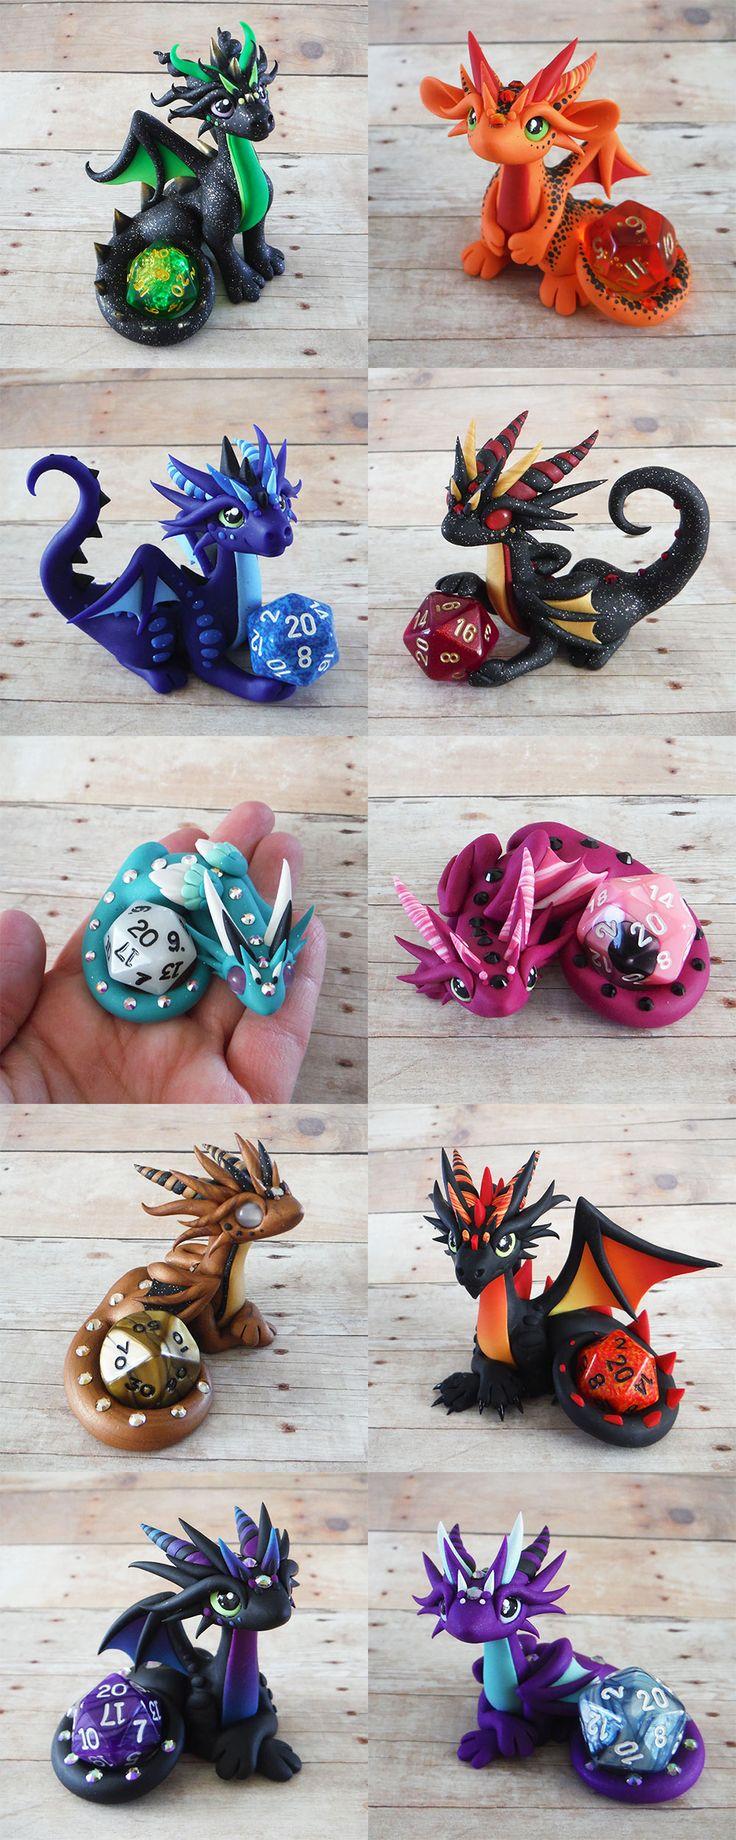 http://dragonsandbeasties.deviantart.com